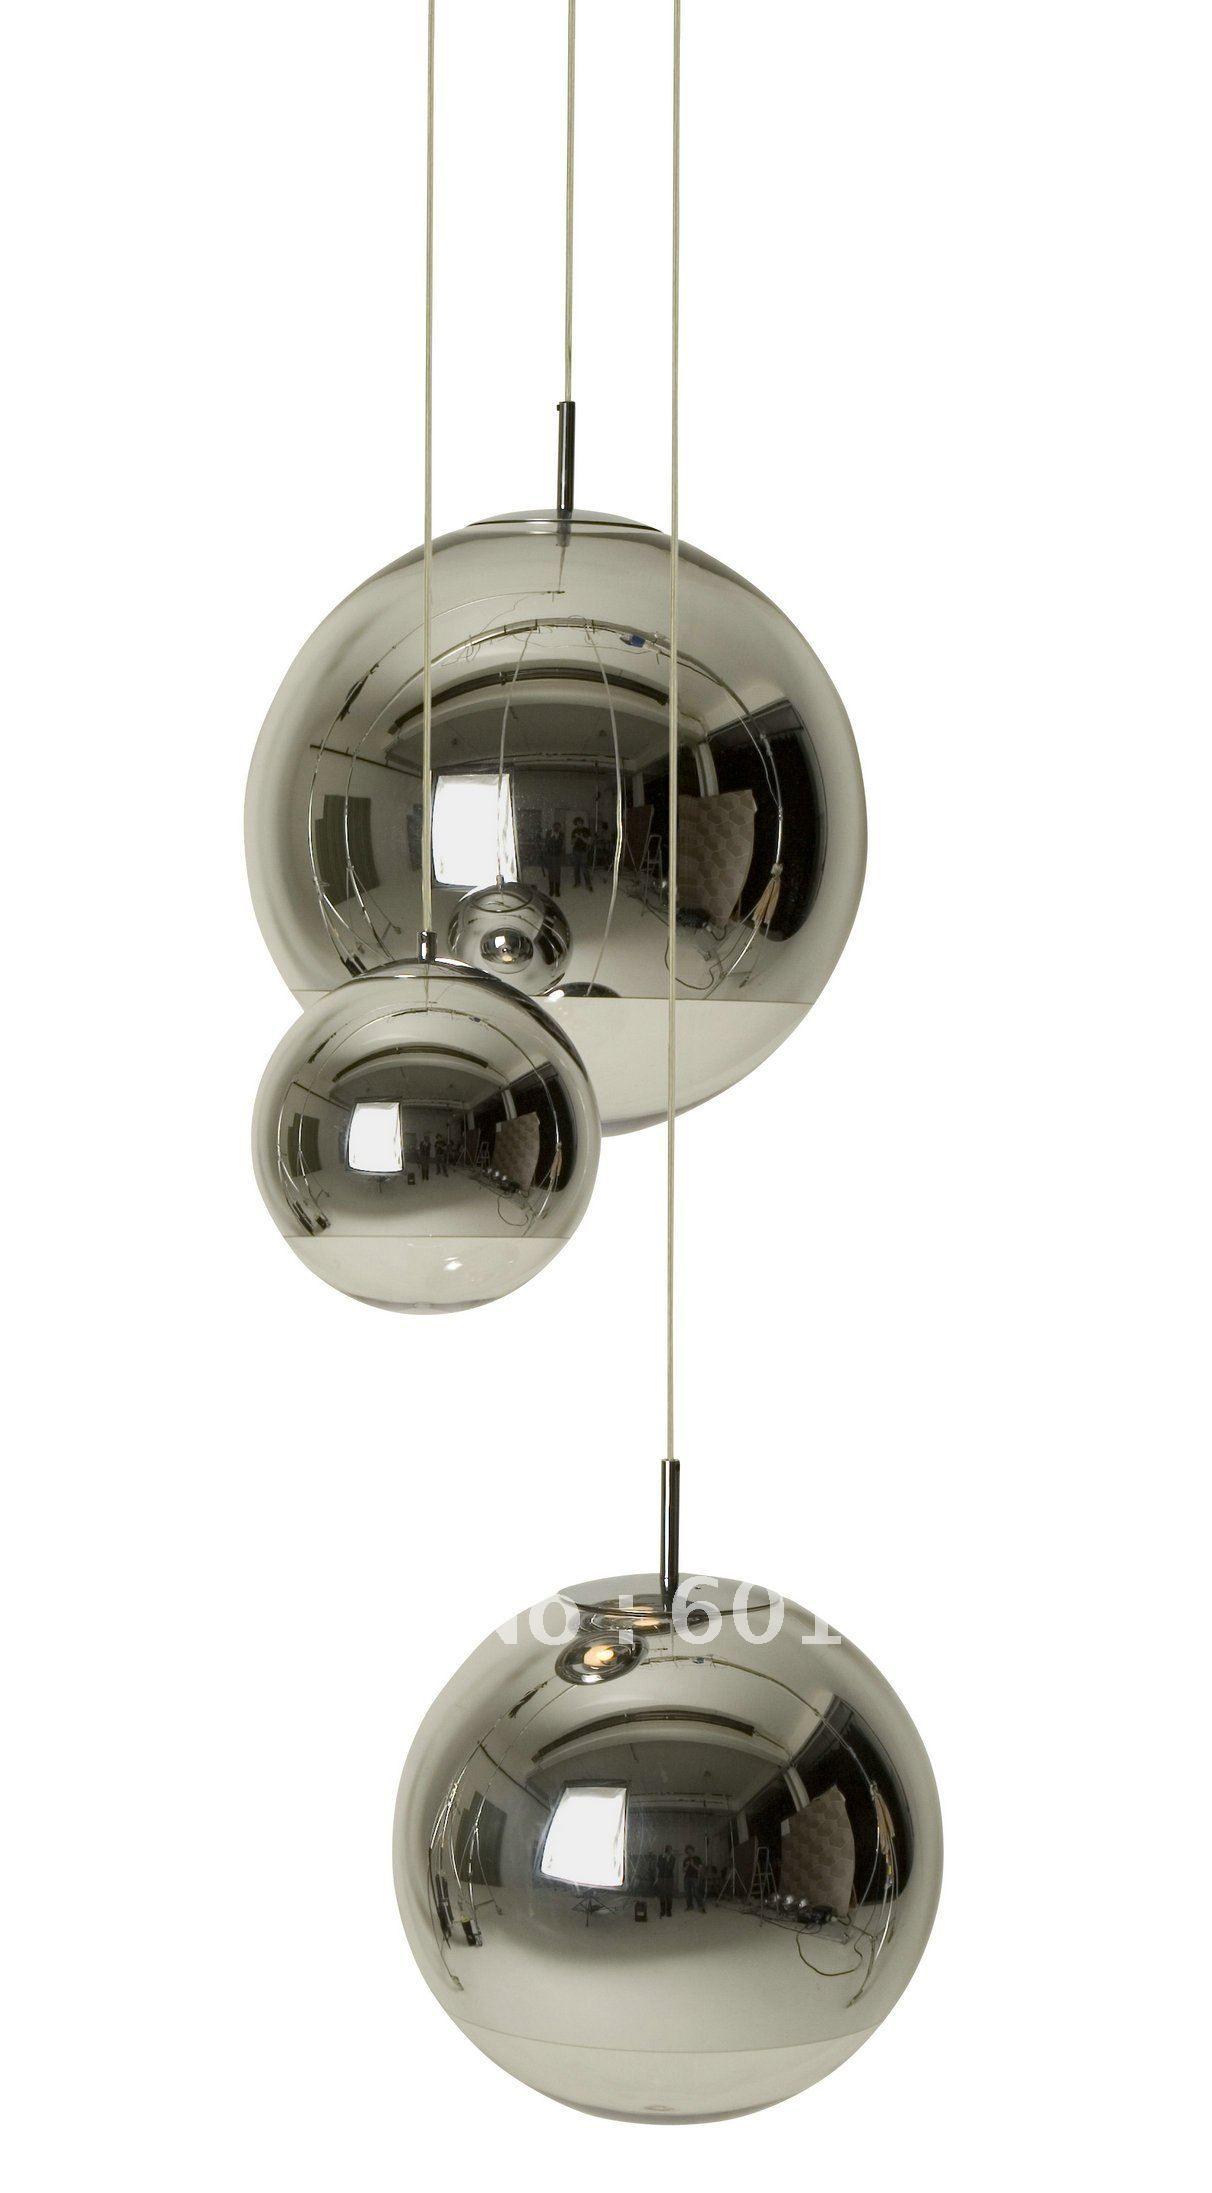 Hot selling tom dixon lustre chandelier 1513cmpyramid copper hot selling tom dixon lustre chandelier 1513cmpyramid copper mirror ballpendant arubaitofo Gallery